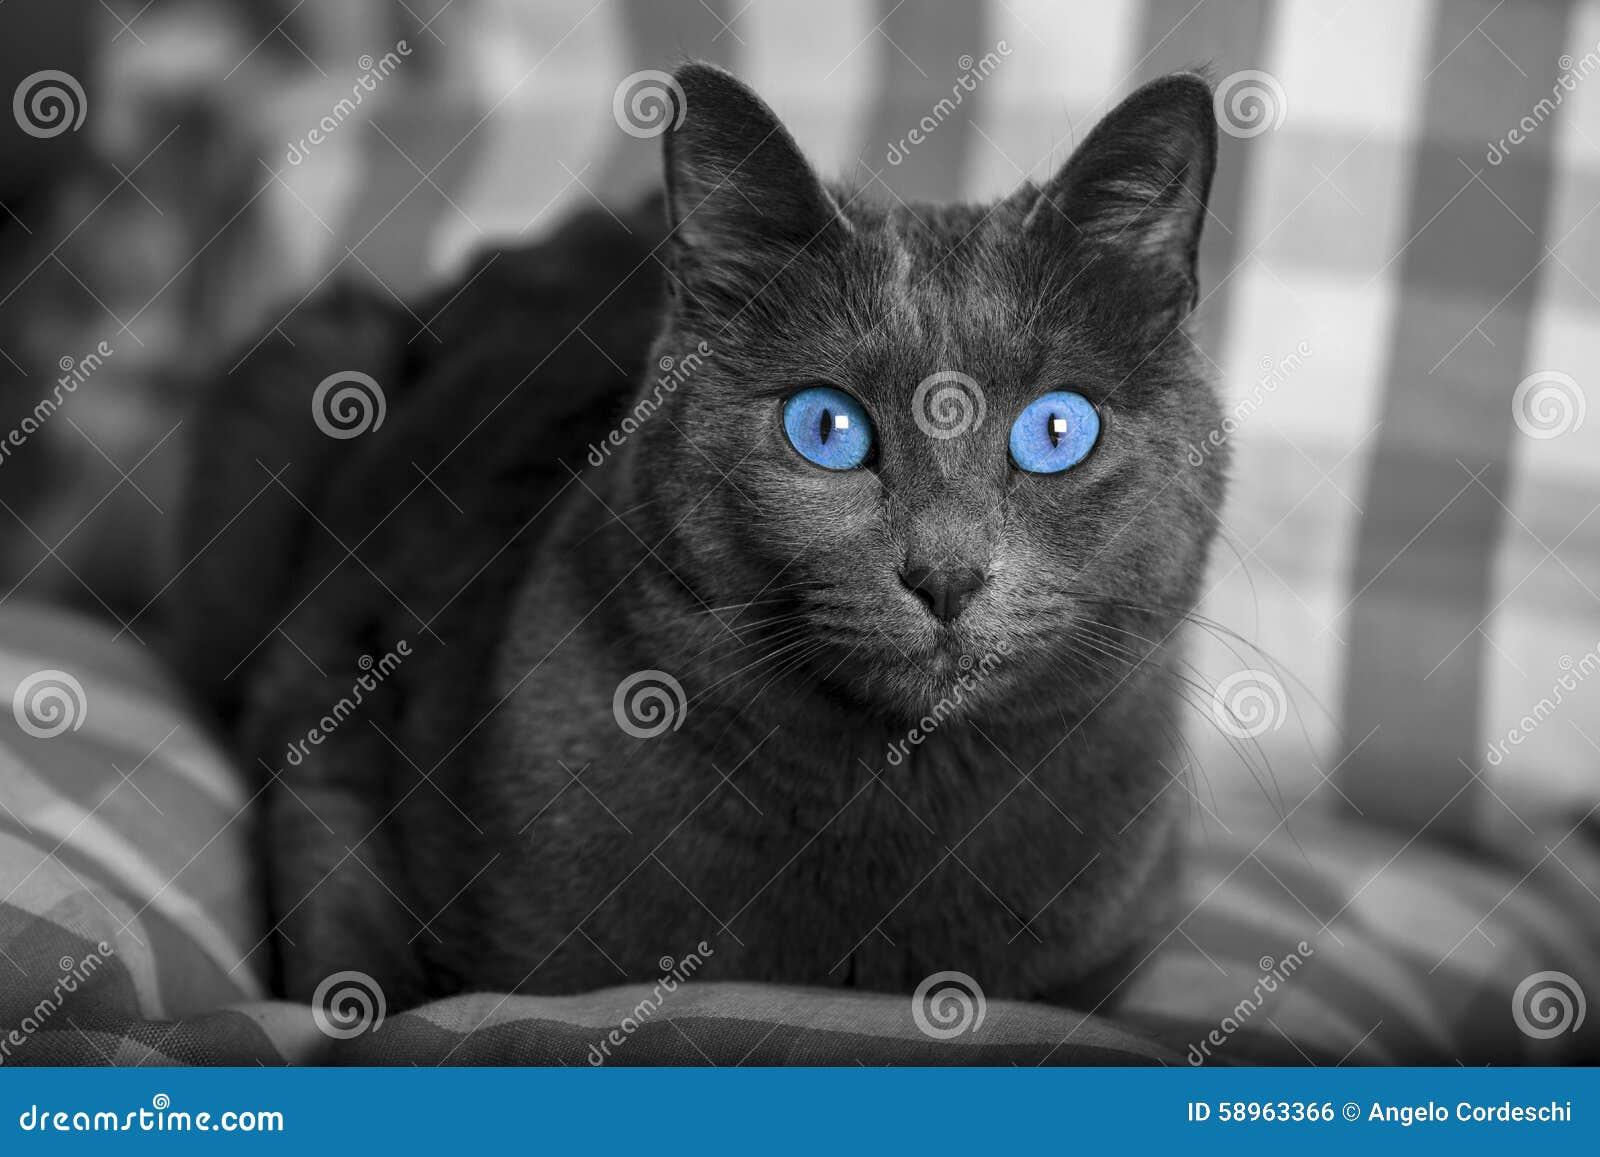 The Black Cat Setings